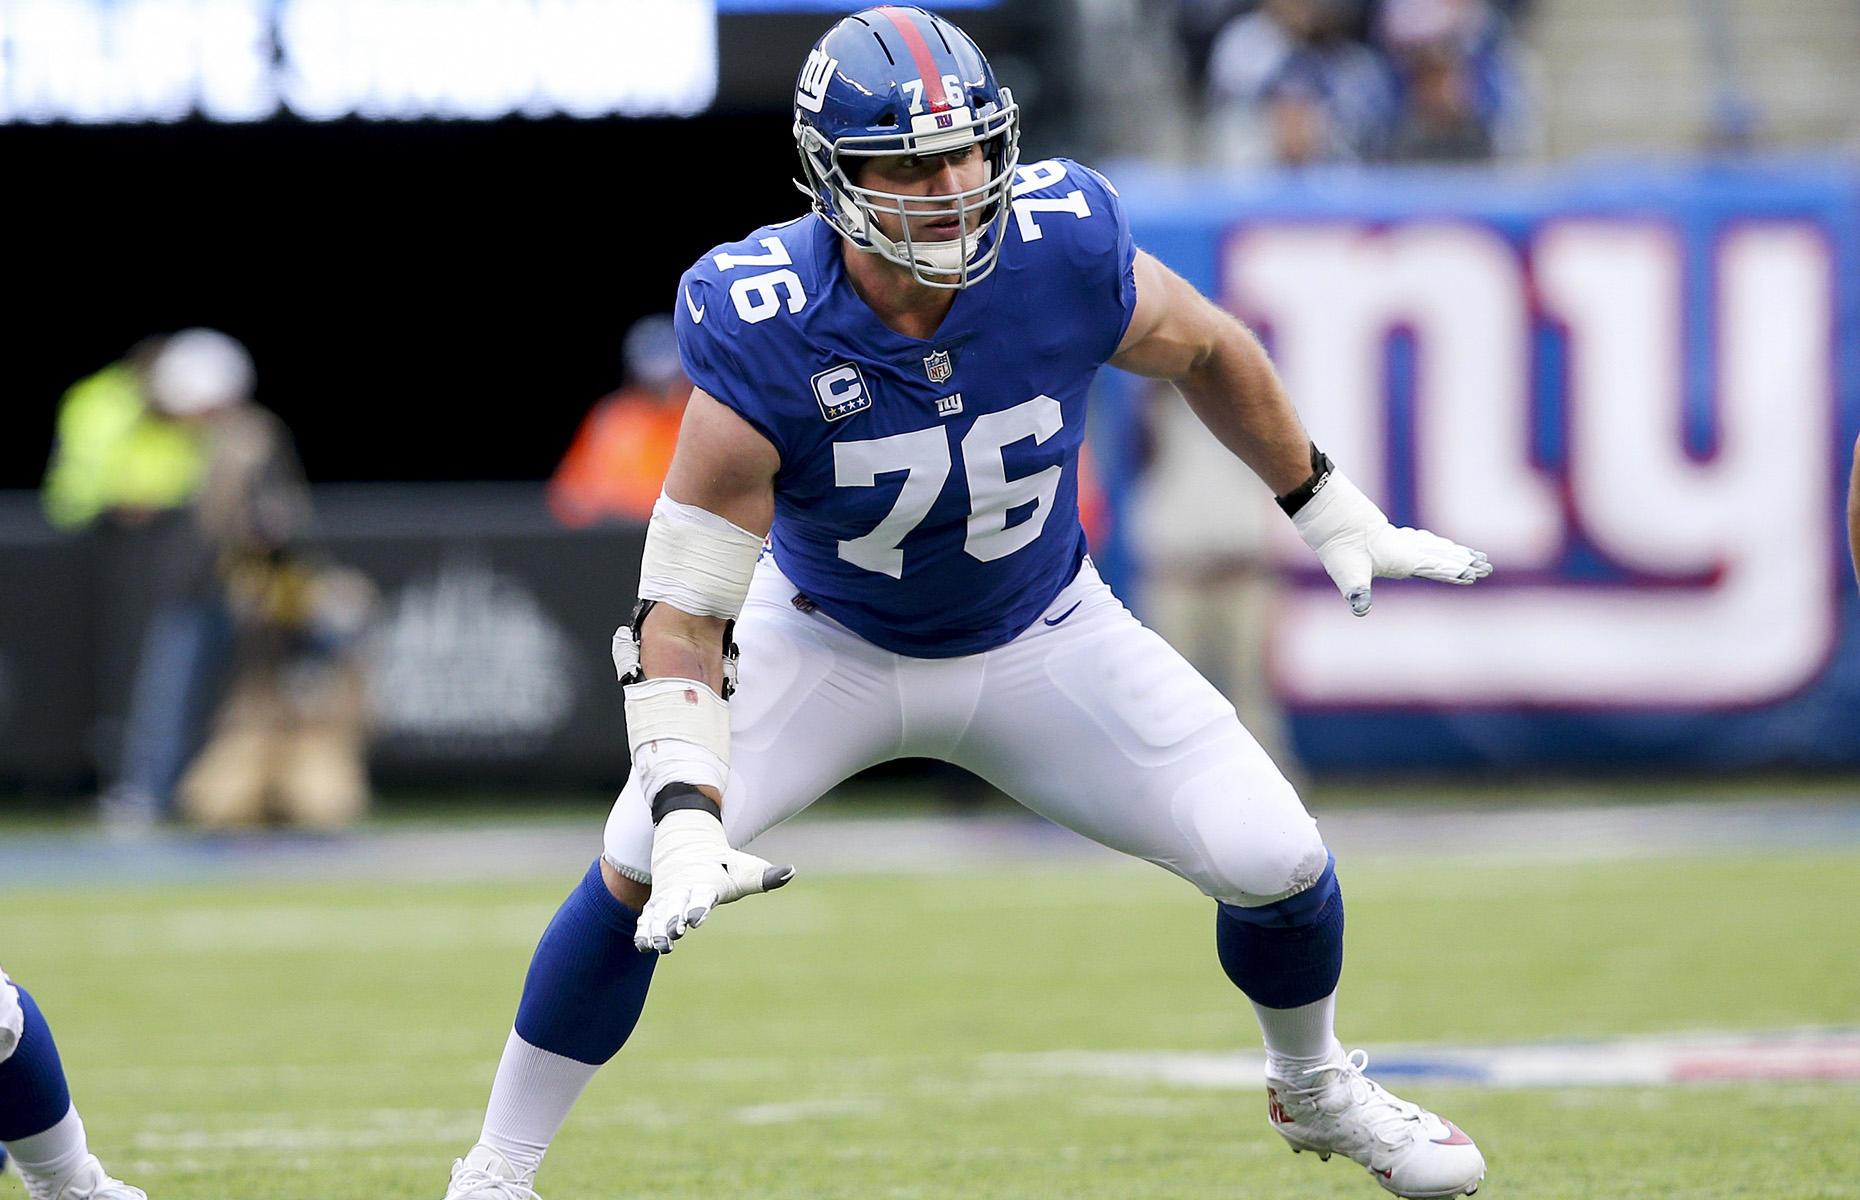 Nate Solder 76 News Stats Photos New York Giants Nfl Msn Sports